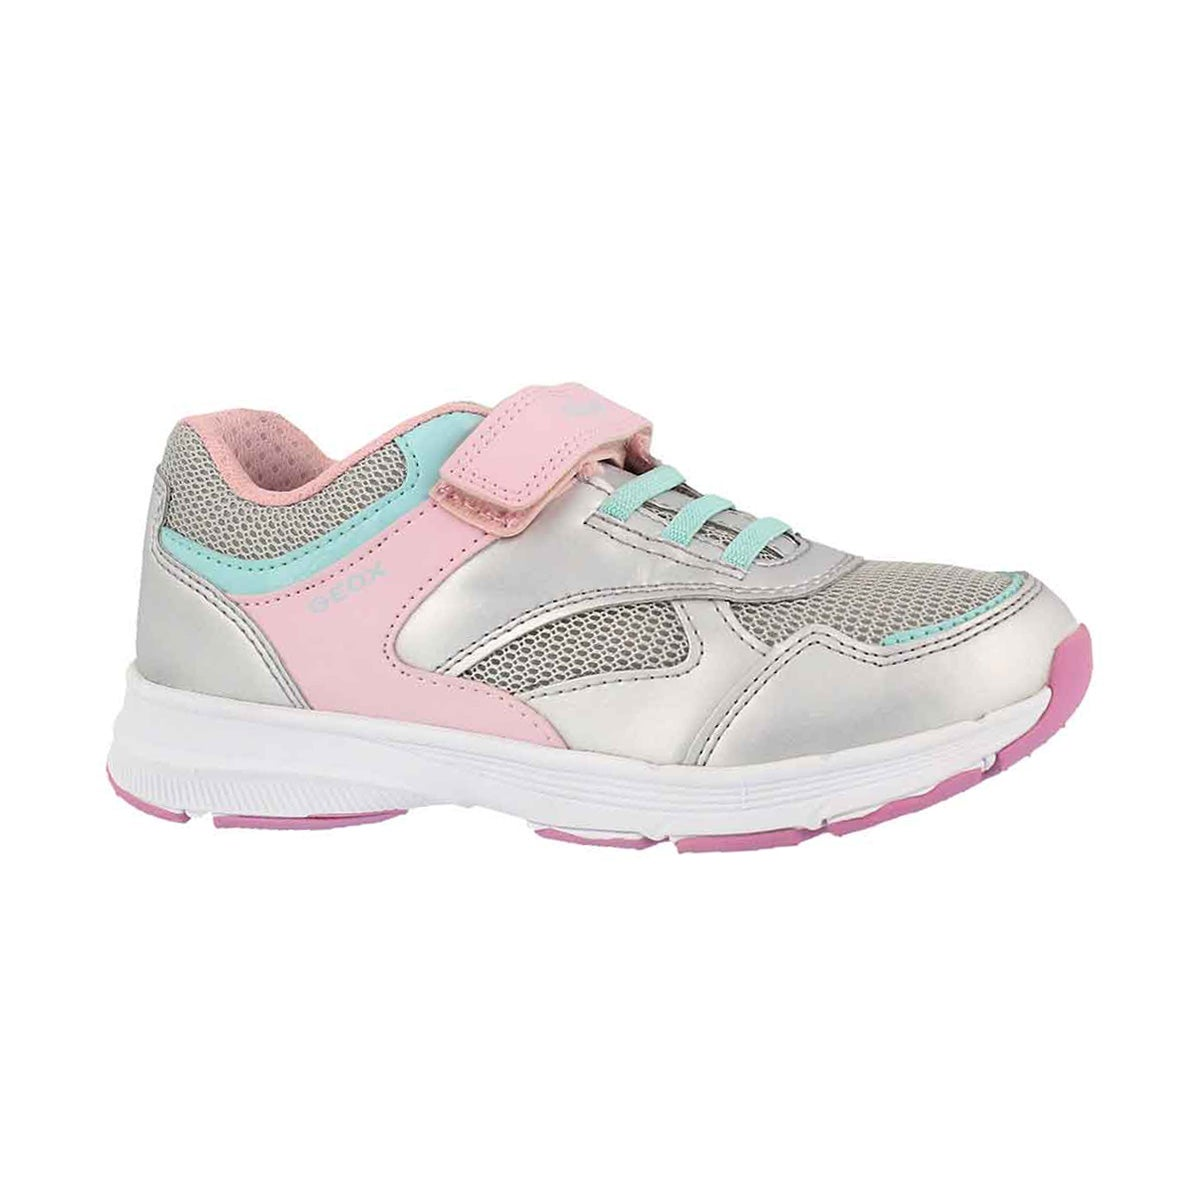 Girls' J HOSHIKO silver/pink sneakers